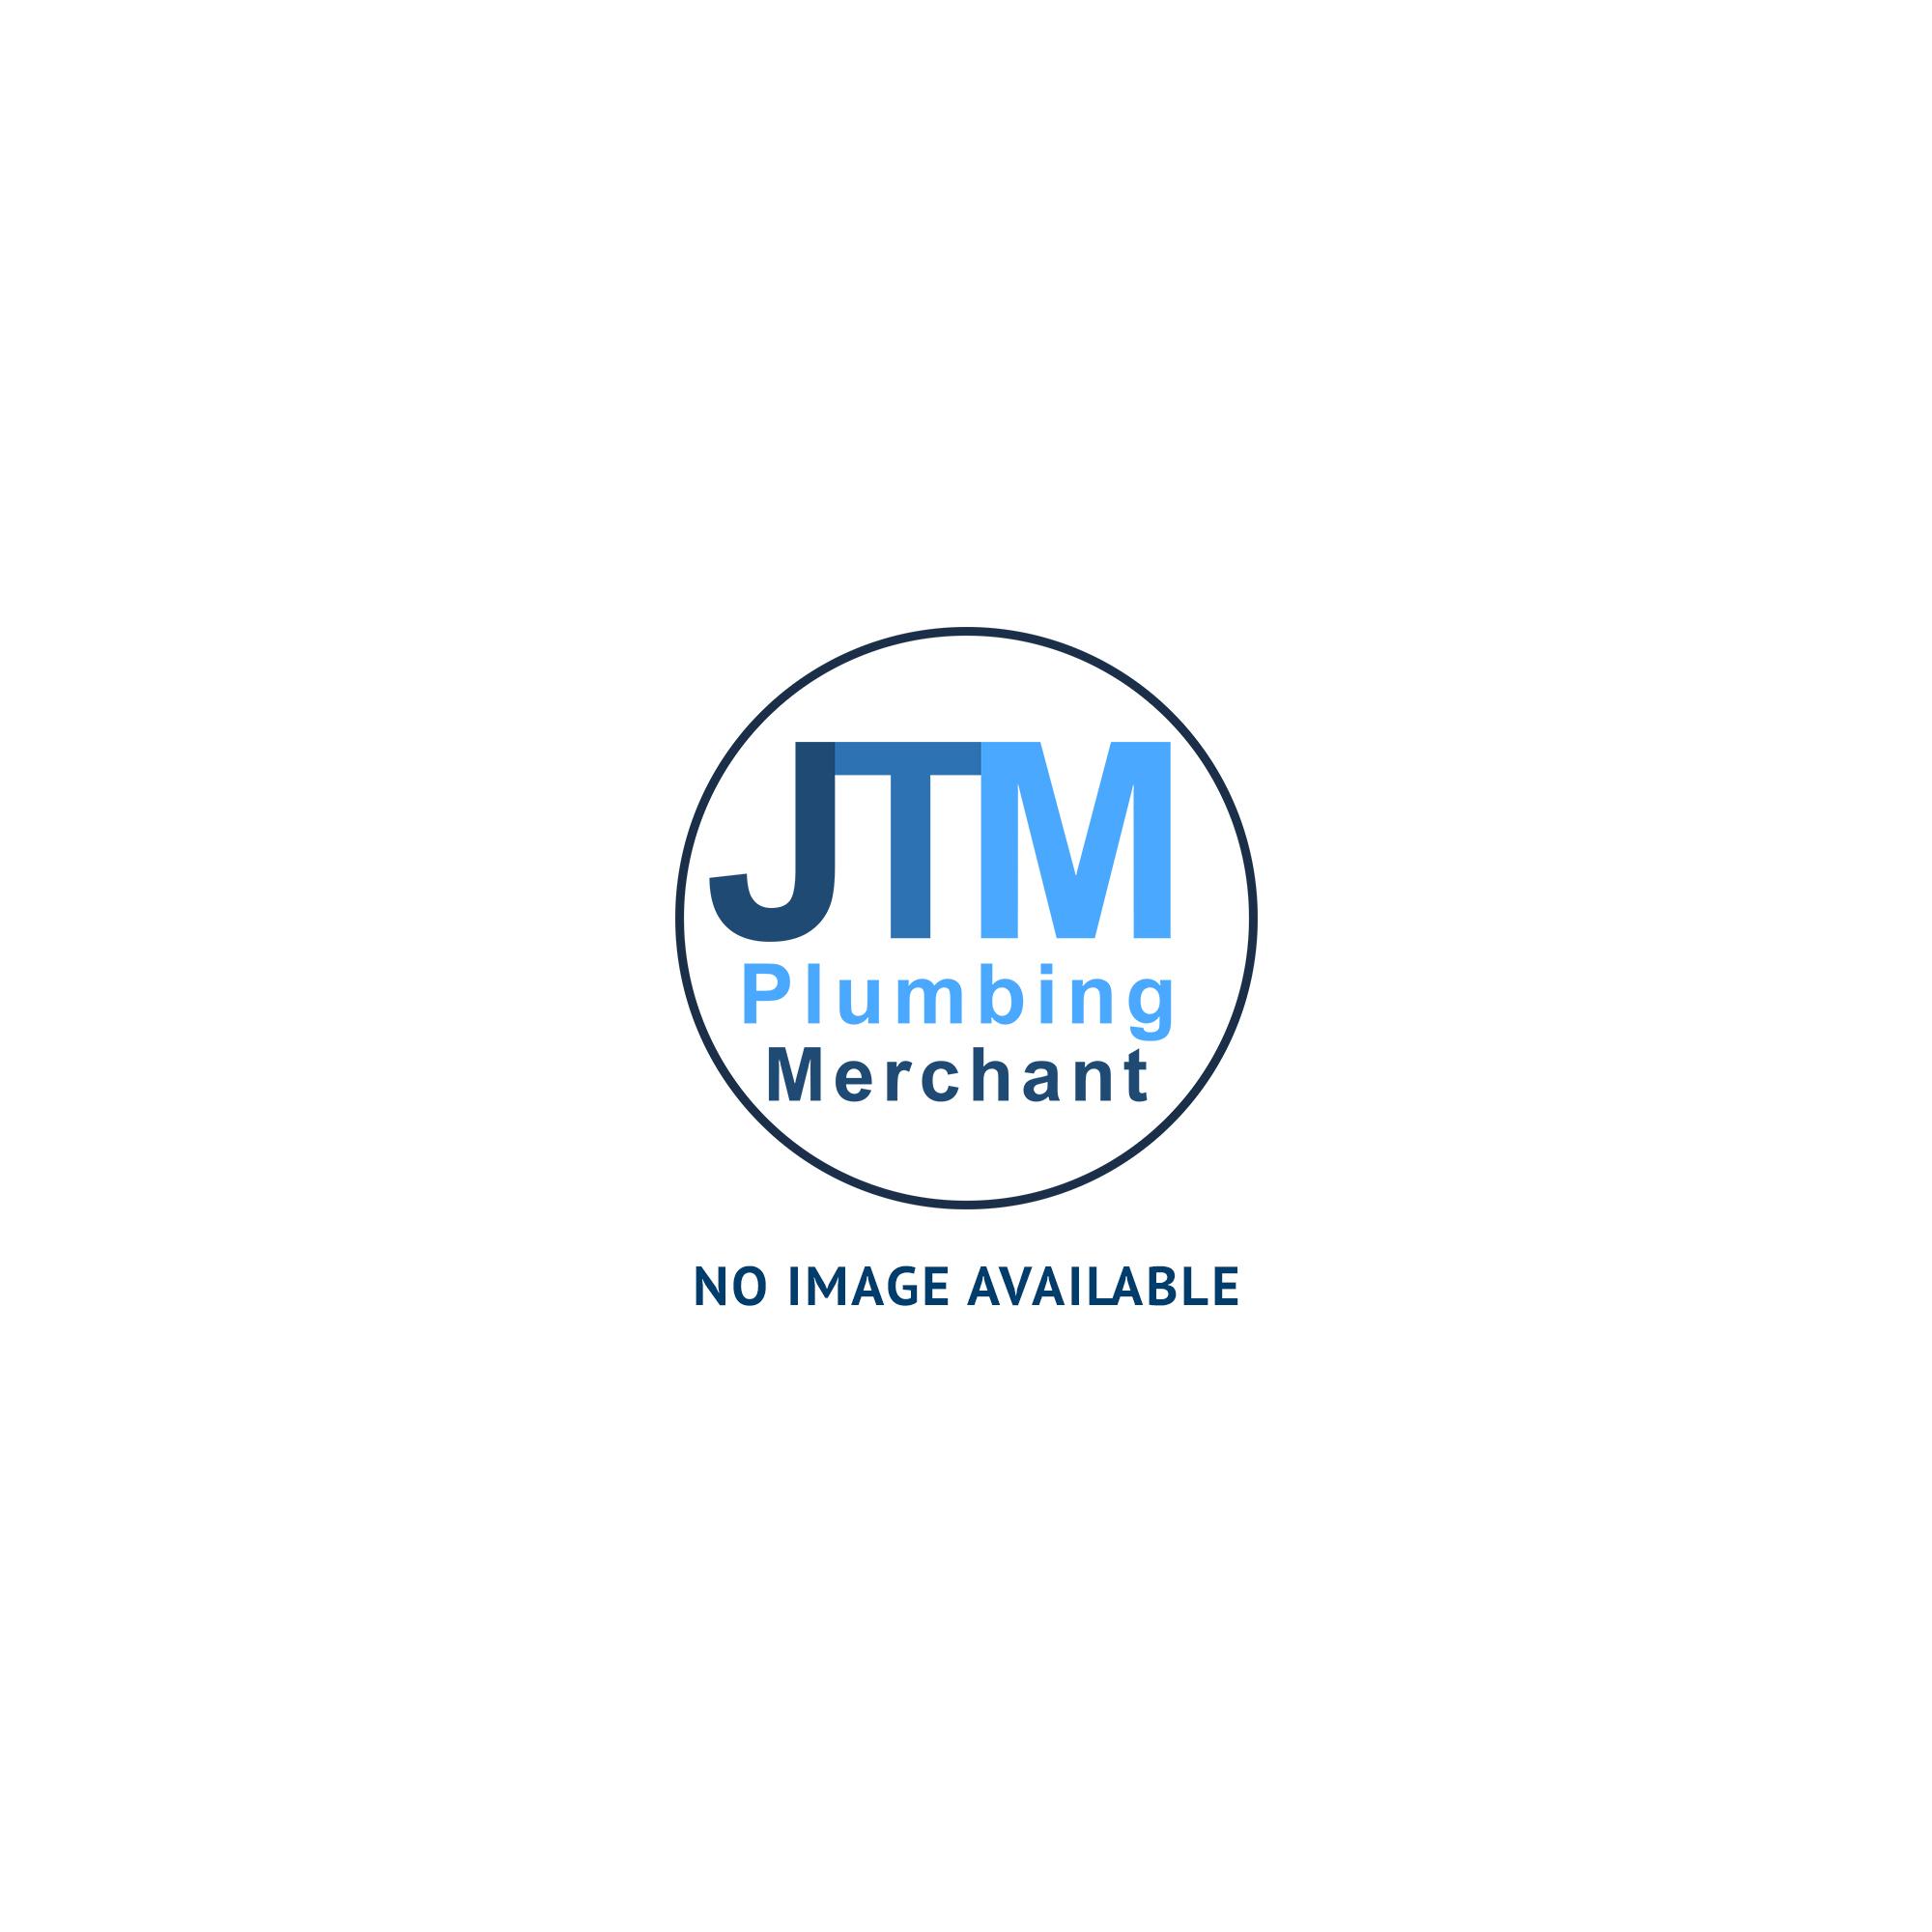 Schutz UFH Manifold Komfort 90-3 (Stainless Steel Manifold)